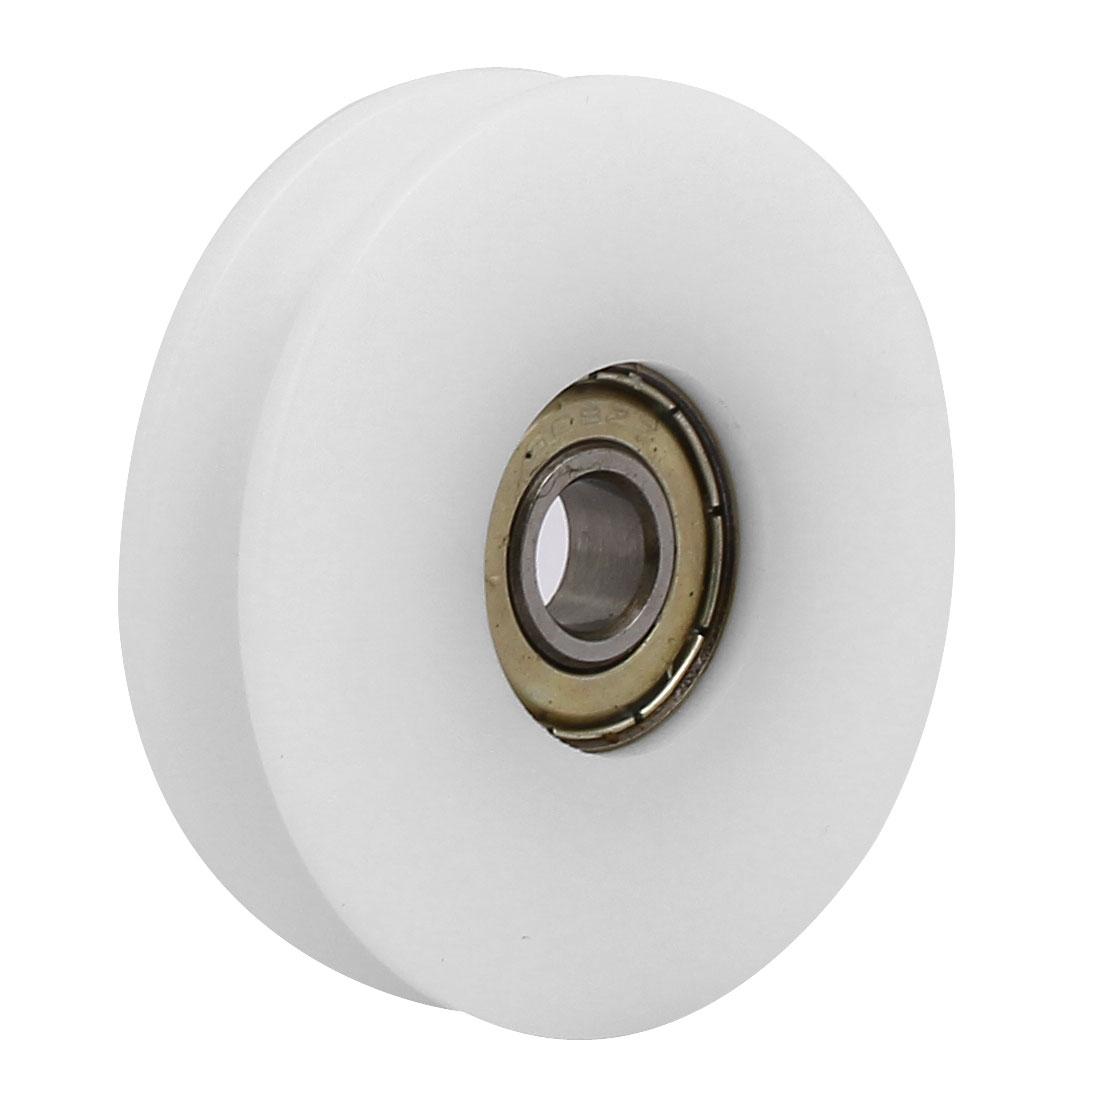 50mmx8mmx12mm Nylon U Groove Bearing Pulley Sliding Converyor Wheel White